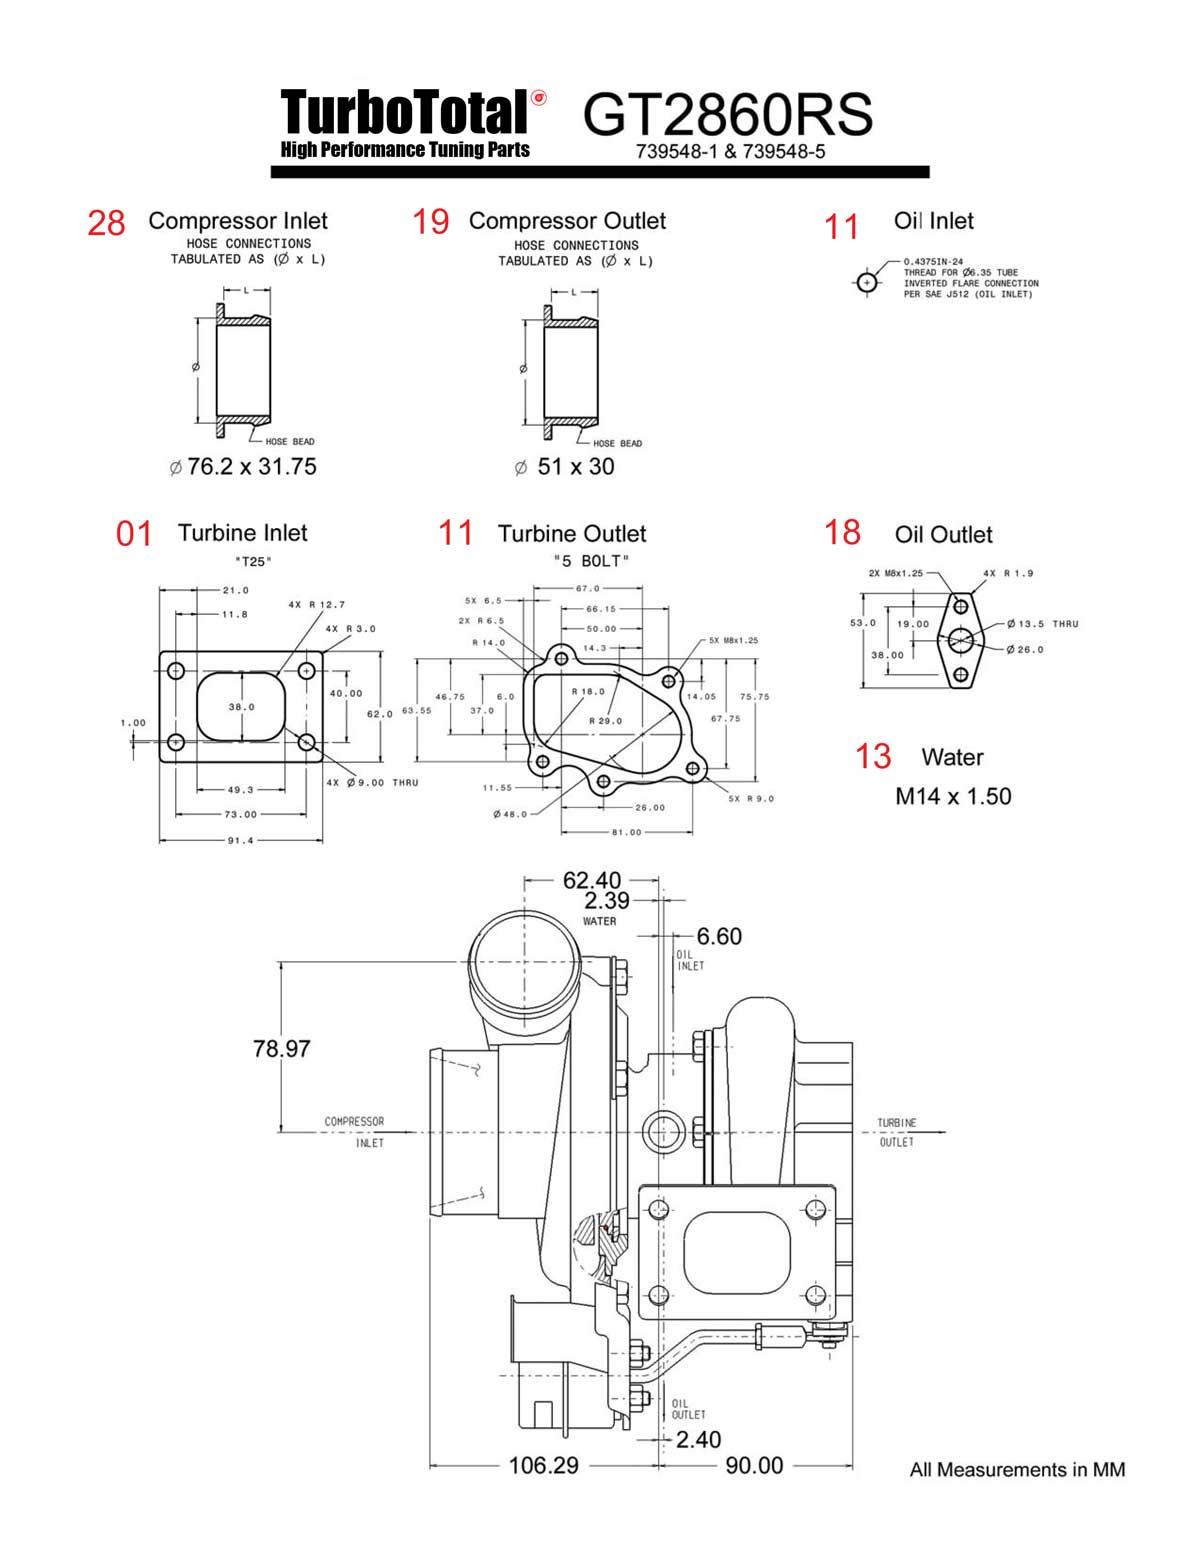 Sae J512 Standard Pdf Download